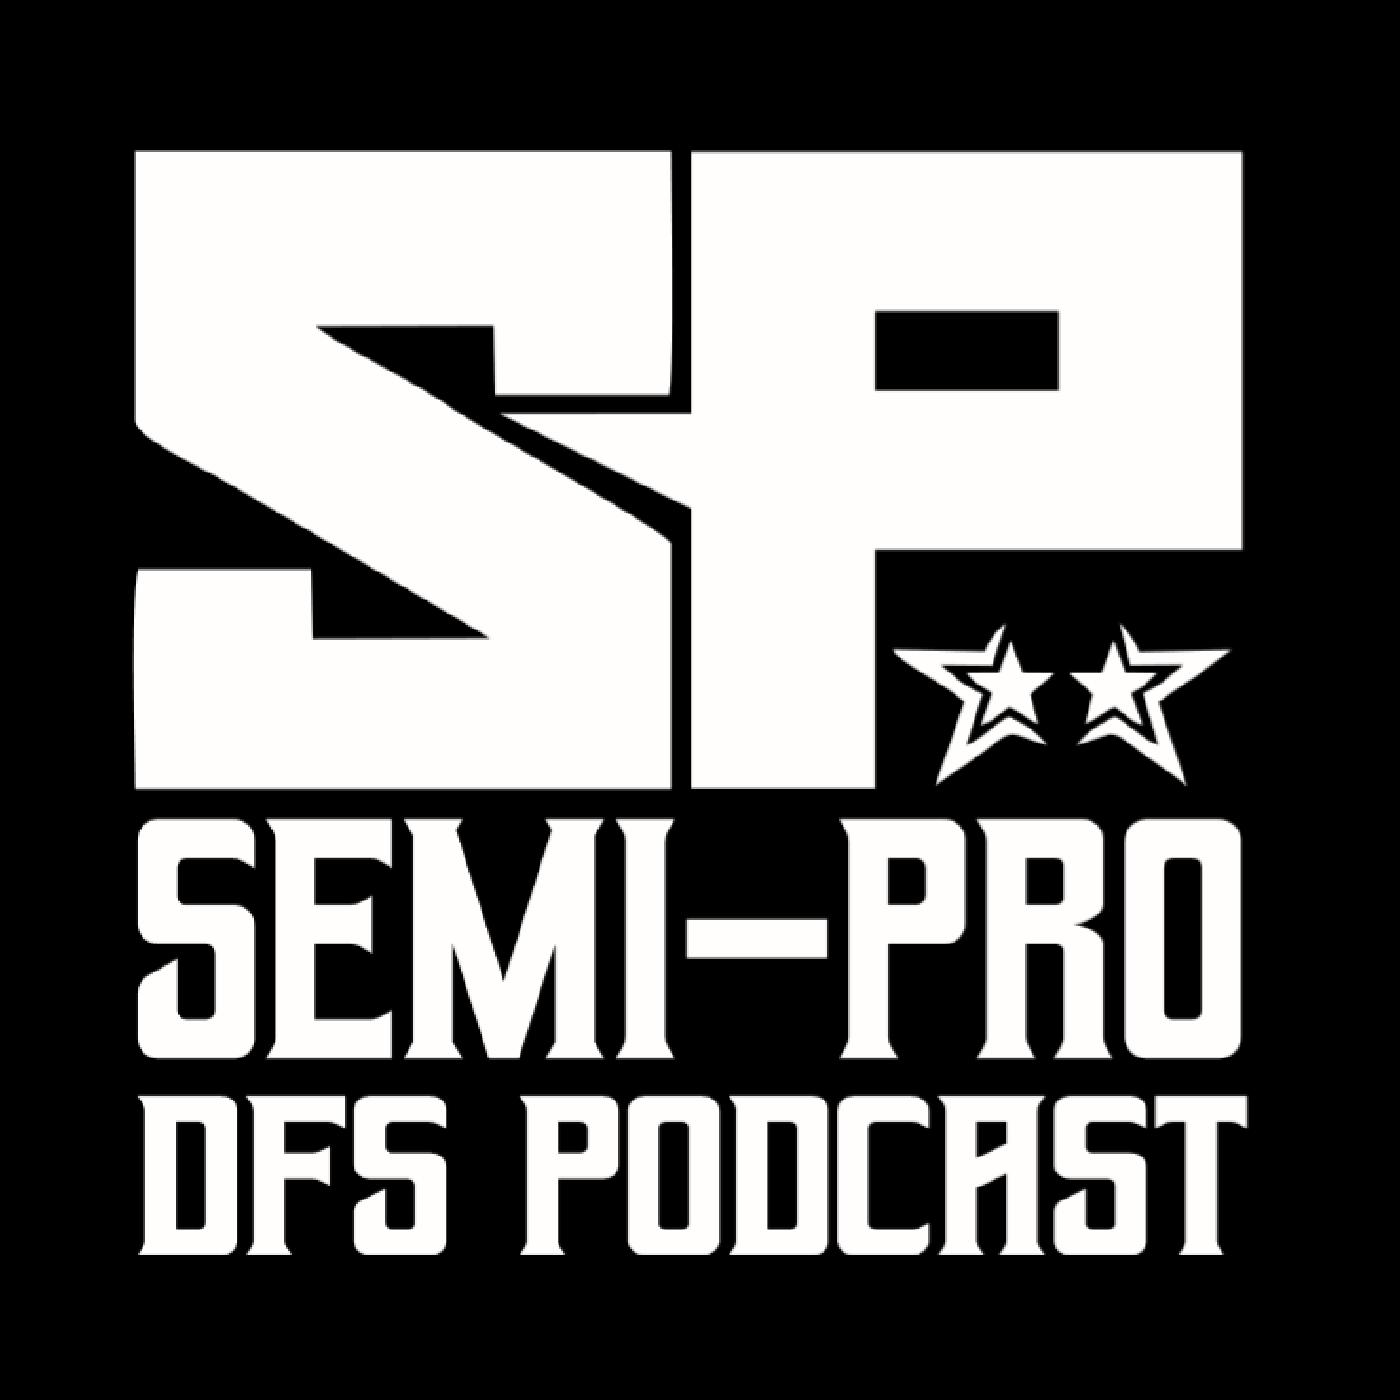 Semi-Pro DFS Podcast show art